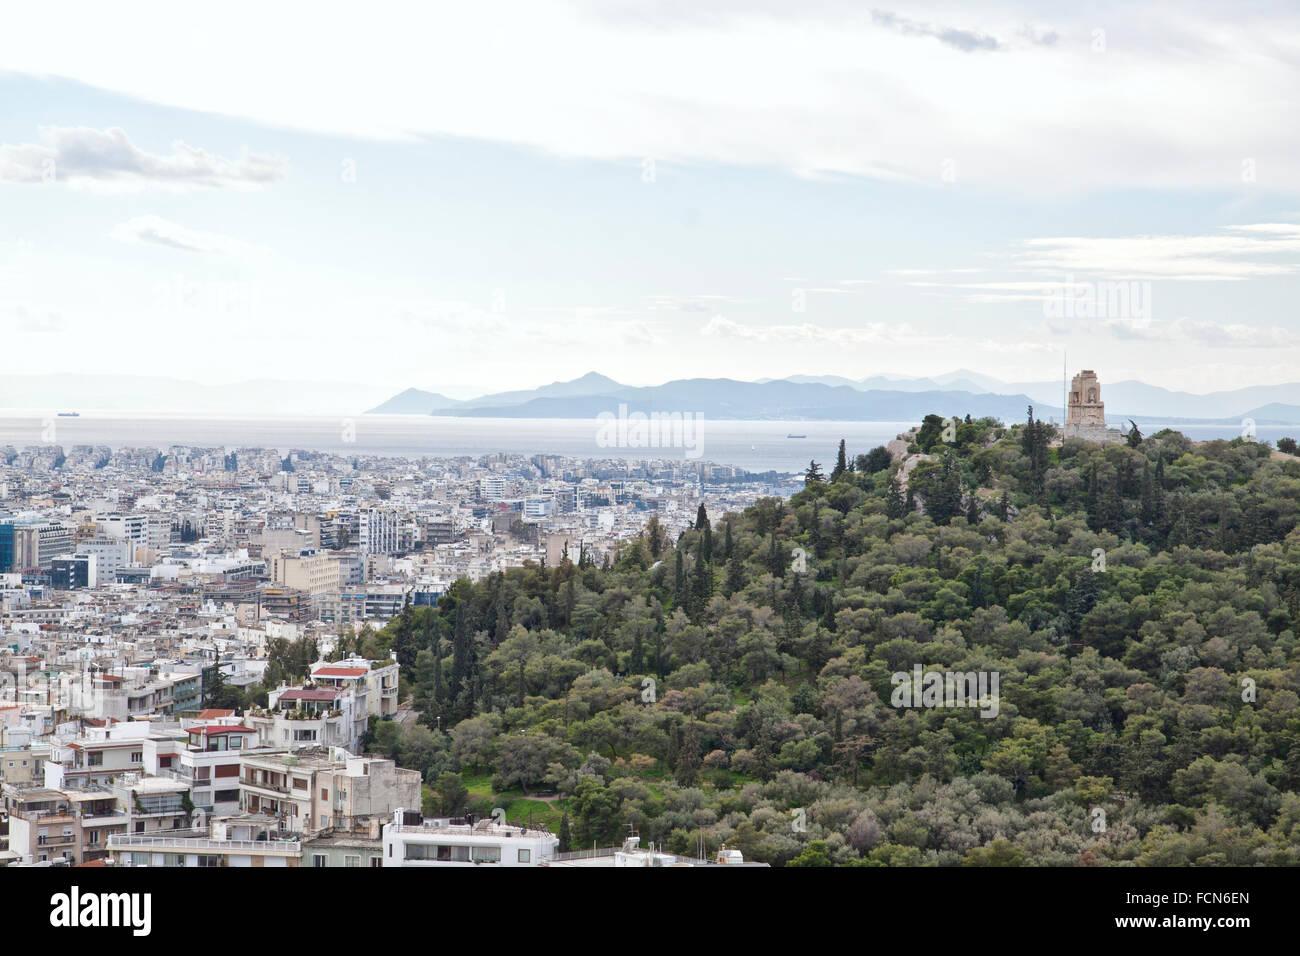 Piraeus is a port city in the region of Attica, Greece. - Stock Image